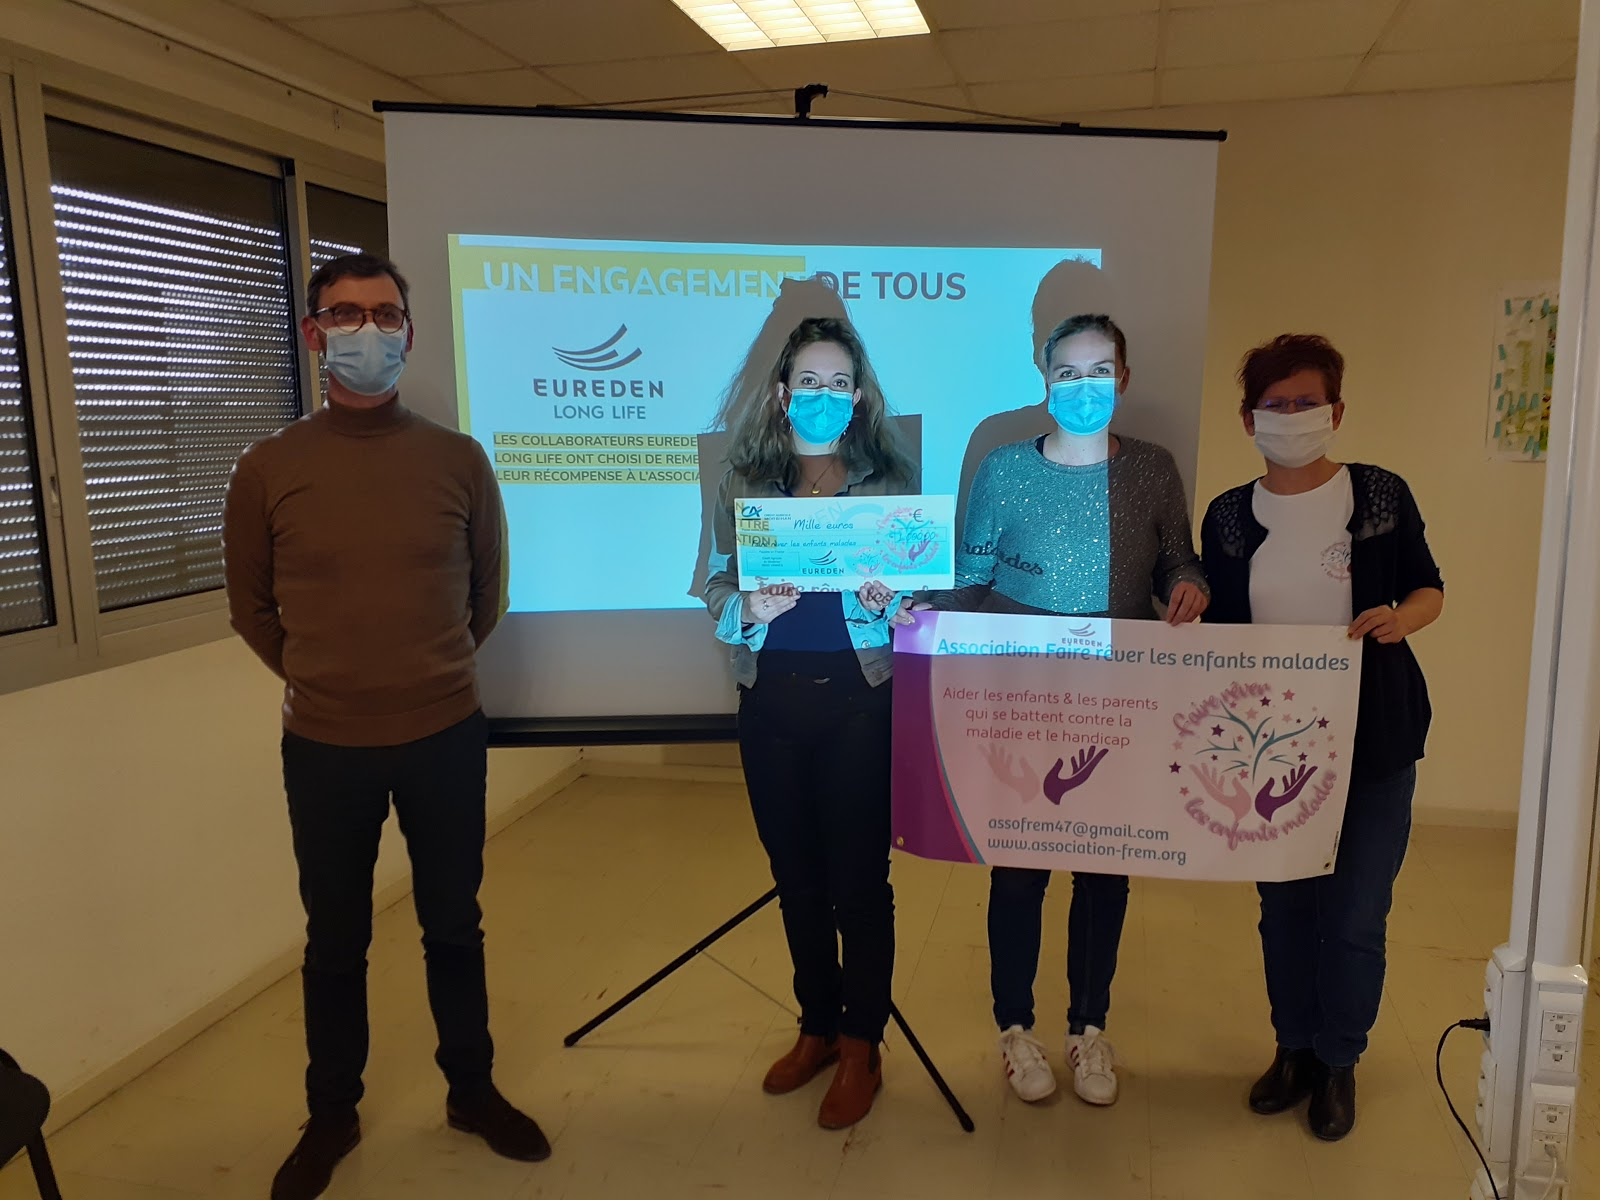 Challenge RSE, Eureden choisit d'aider 2 associations